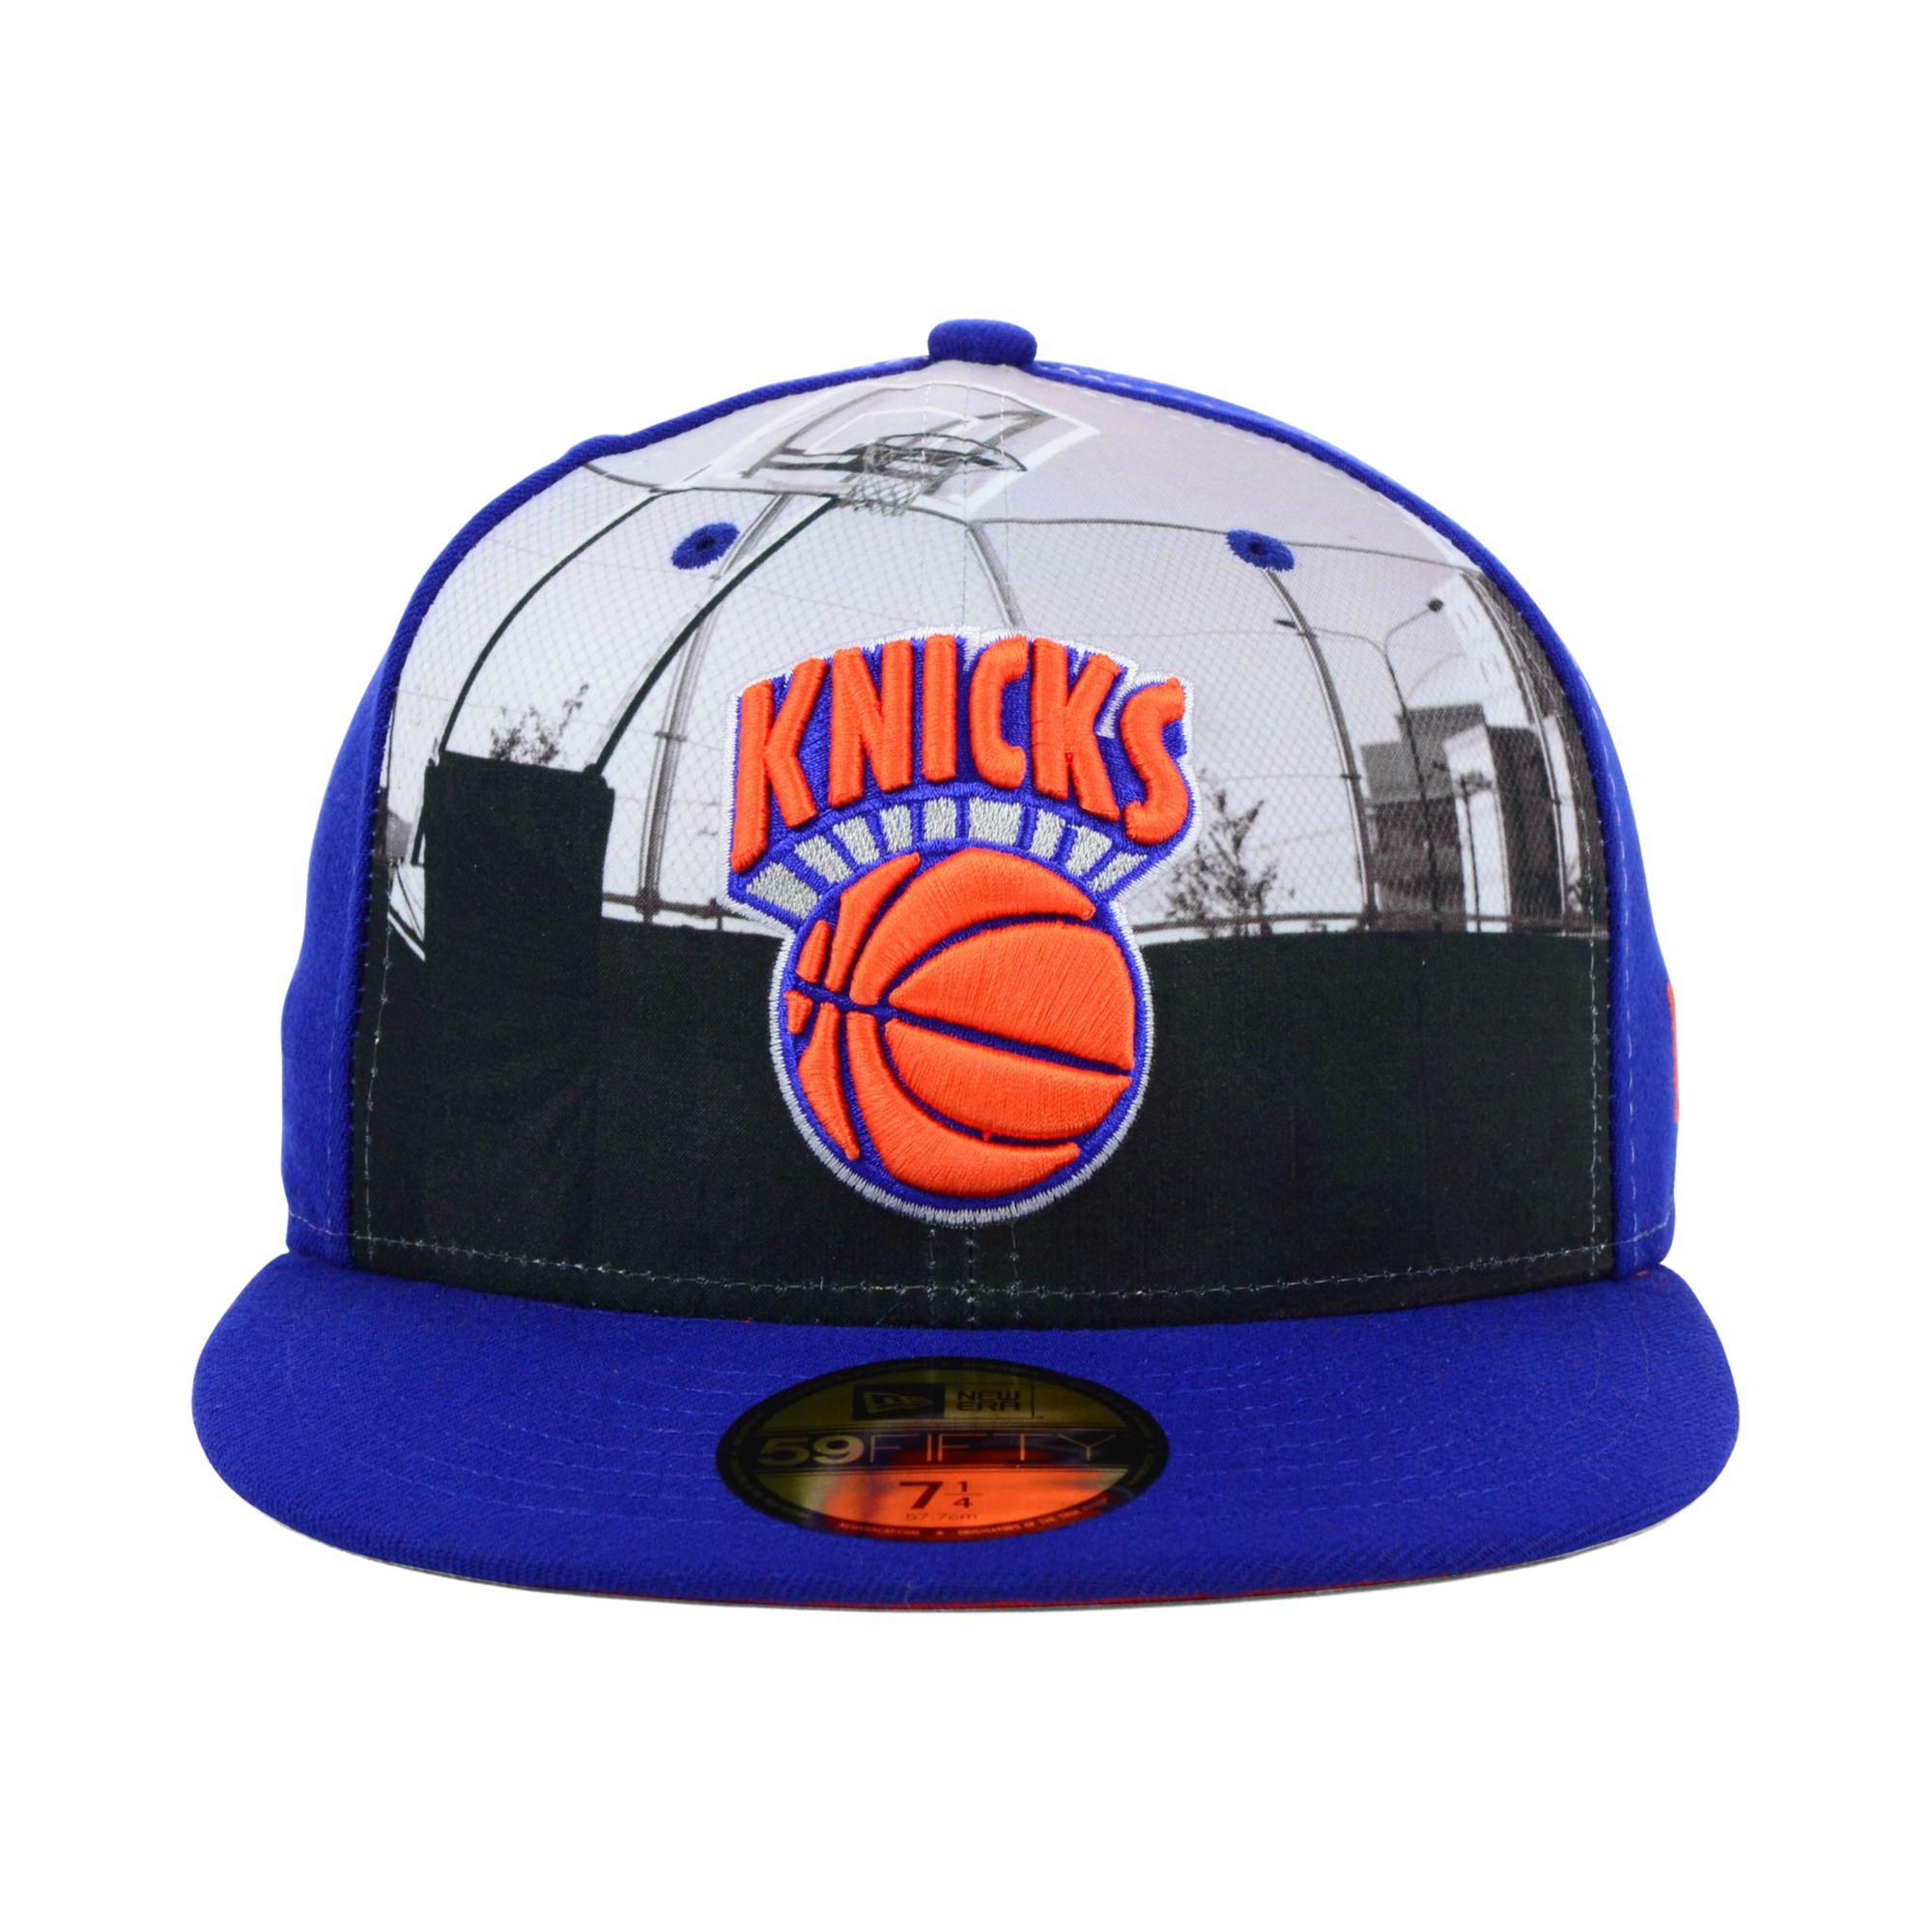 New Era New York Knicks Nba Hardwood Classics 59fifty Cap